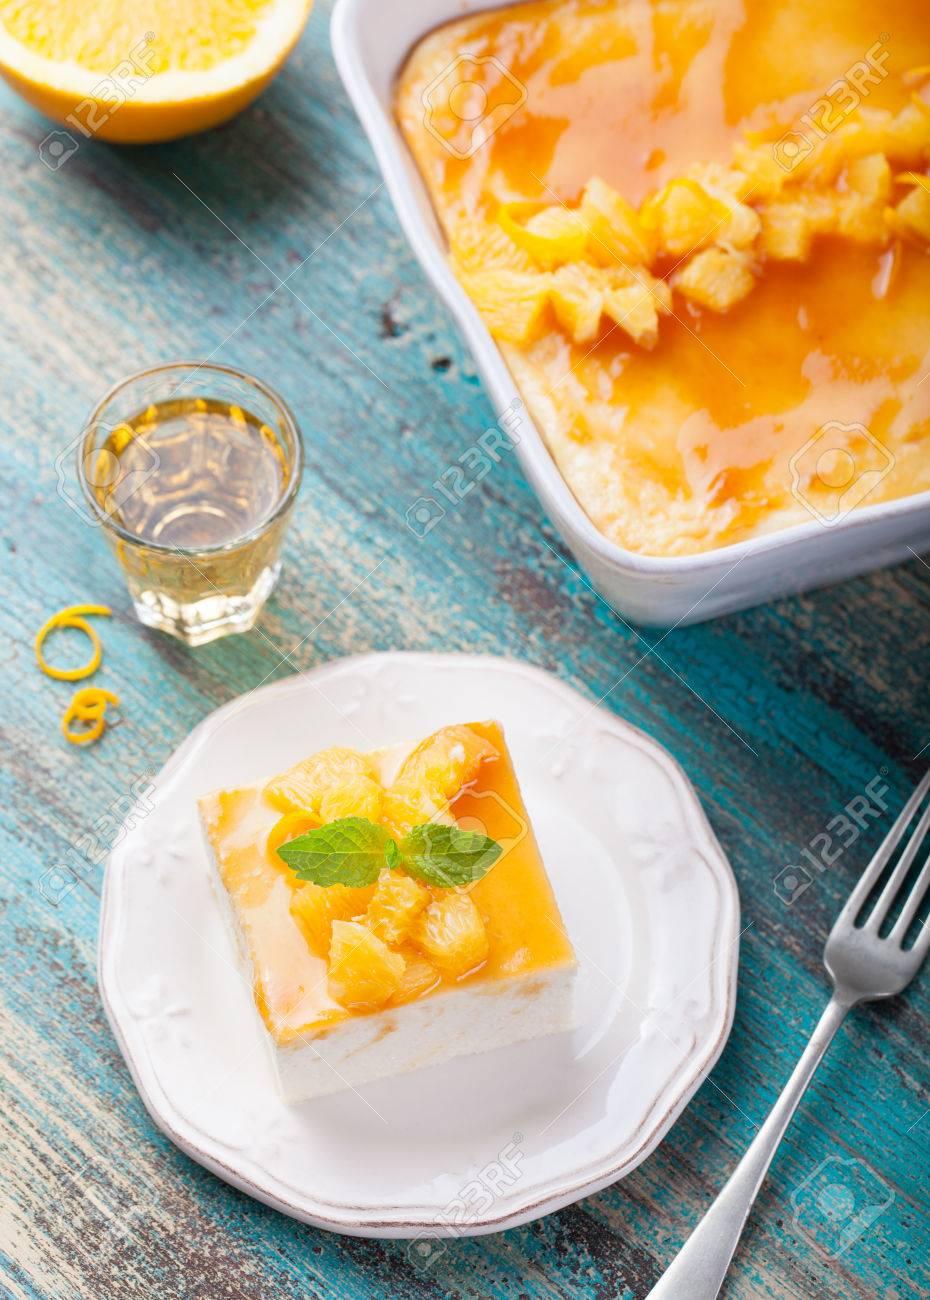 Marmalade-Glazed Orange Cheesecake recommendations